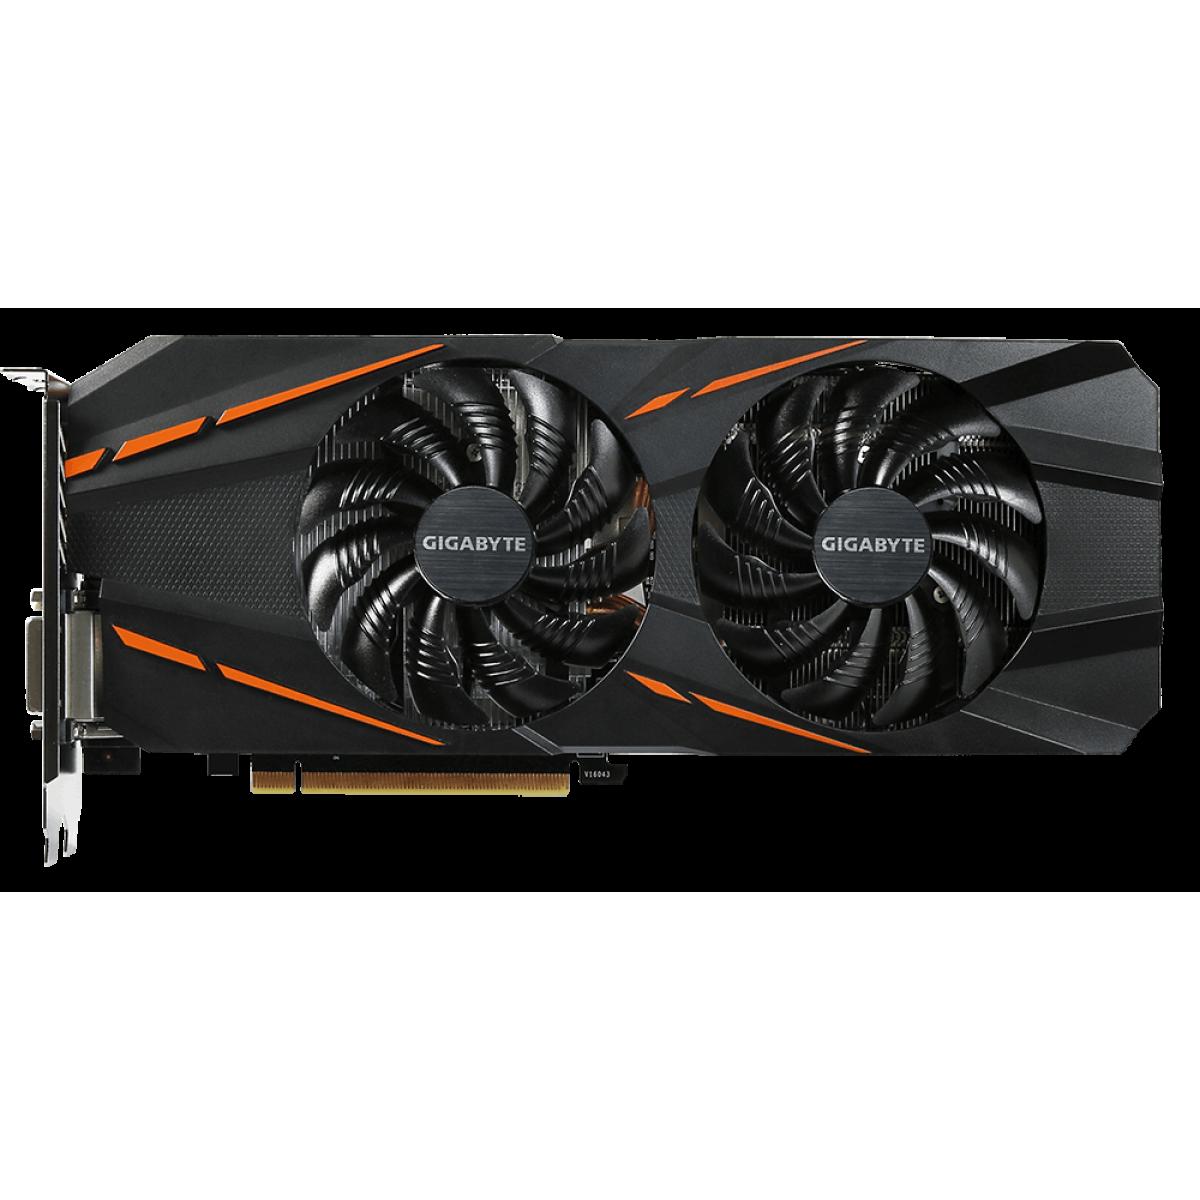 Placa de Video Gigabyte GeForce GTX 1060 G1 Gaming 6GB GV-N1060G1 GAMING-6GD R2 GDDR5 PCI-EXP